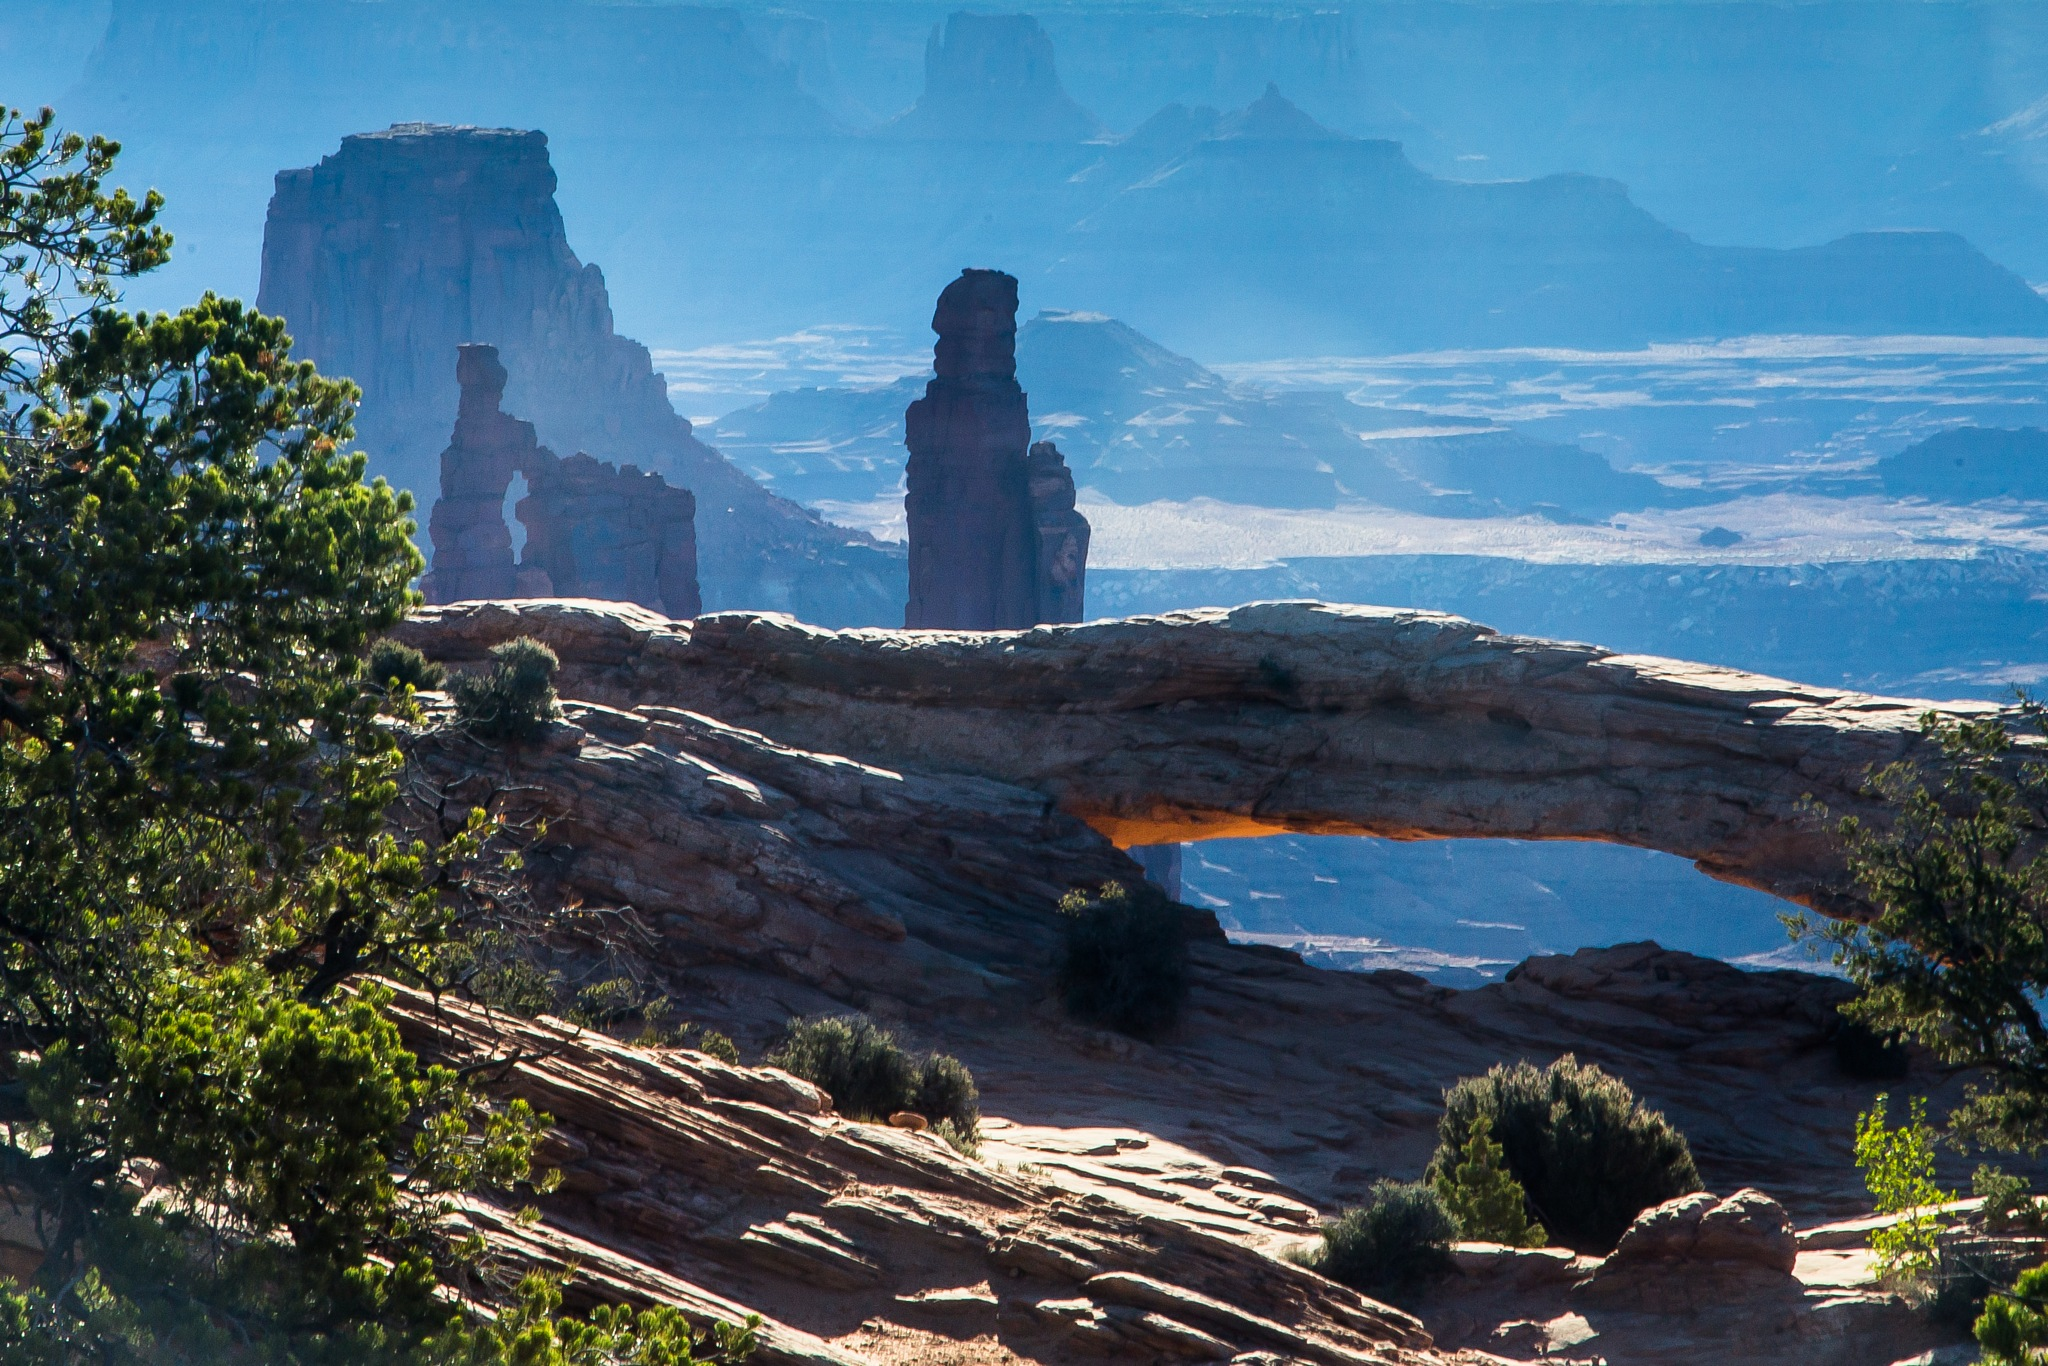 Mesa Arch, Canyonlands by volkhard sturzbecher